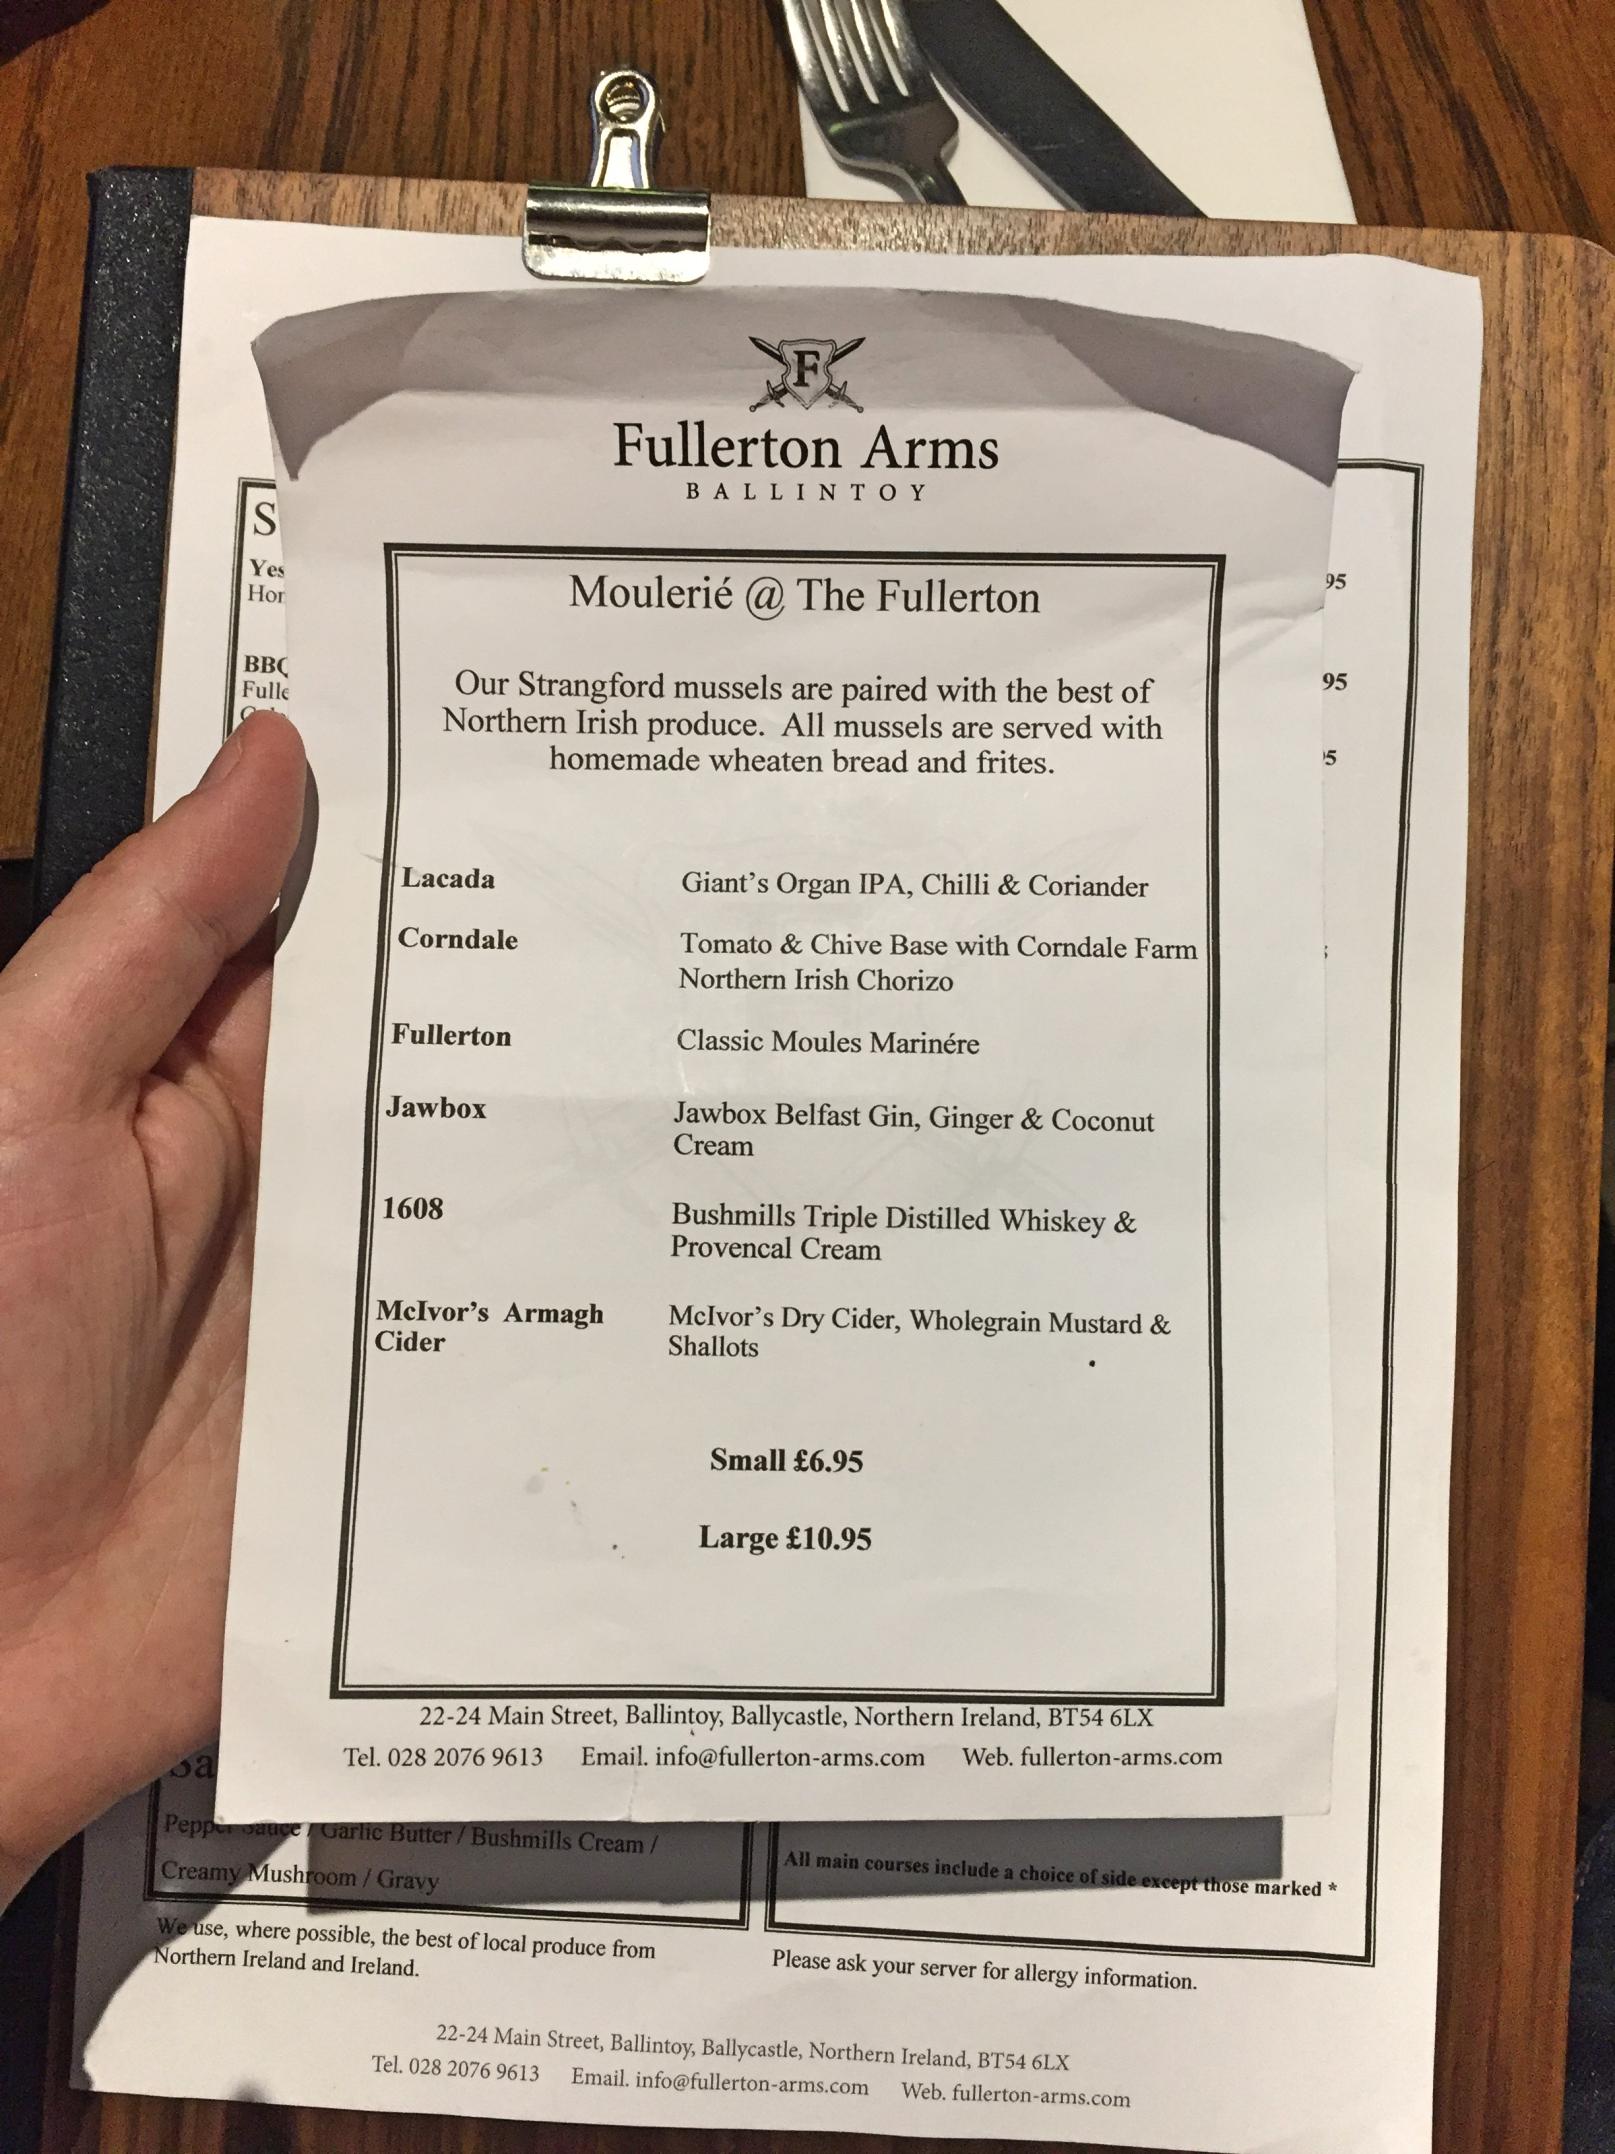 fullerton_arms_pub_guesthouse_menu_ballintoy_northern_ireland_niexplorer_ni_explorer (3).jpg